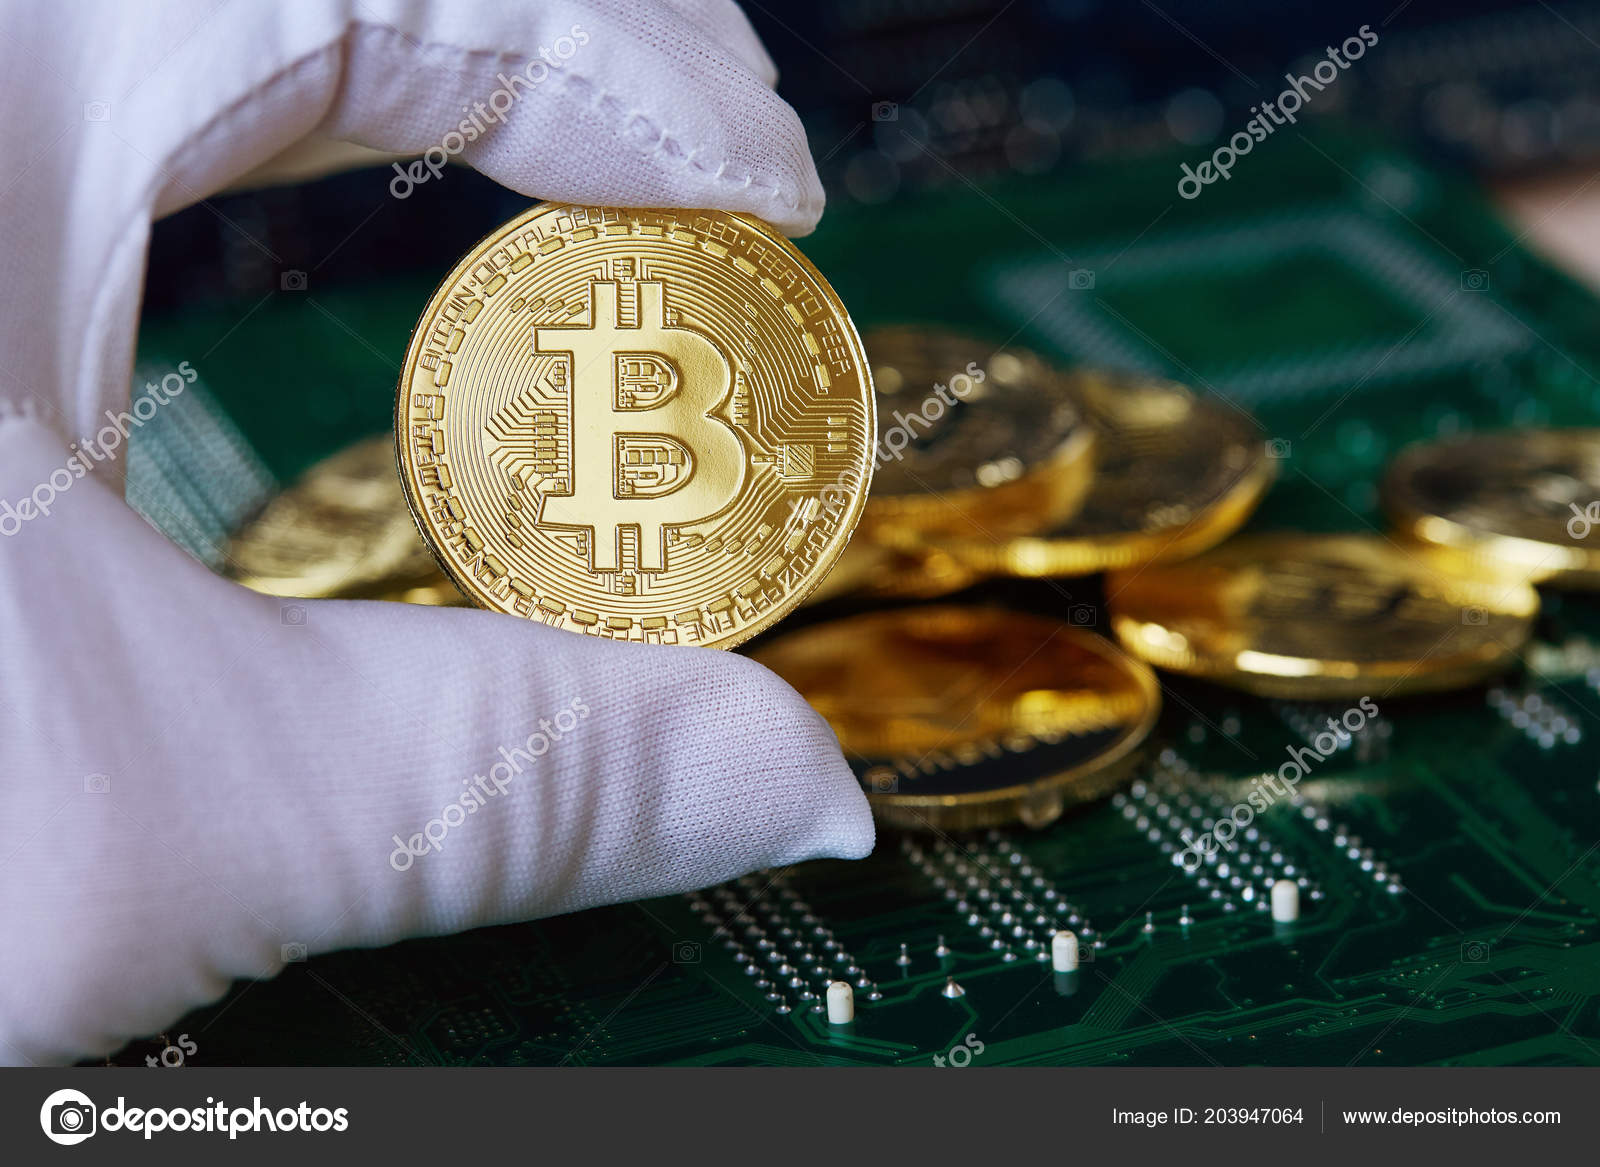 Куплю биткоины с рук в руки игра в биржа